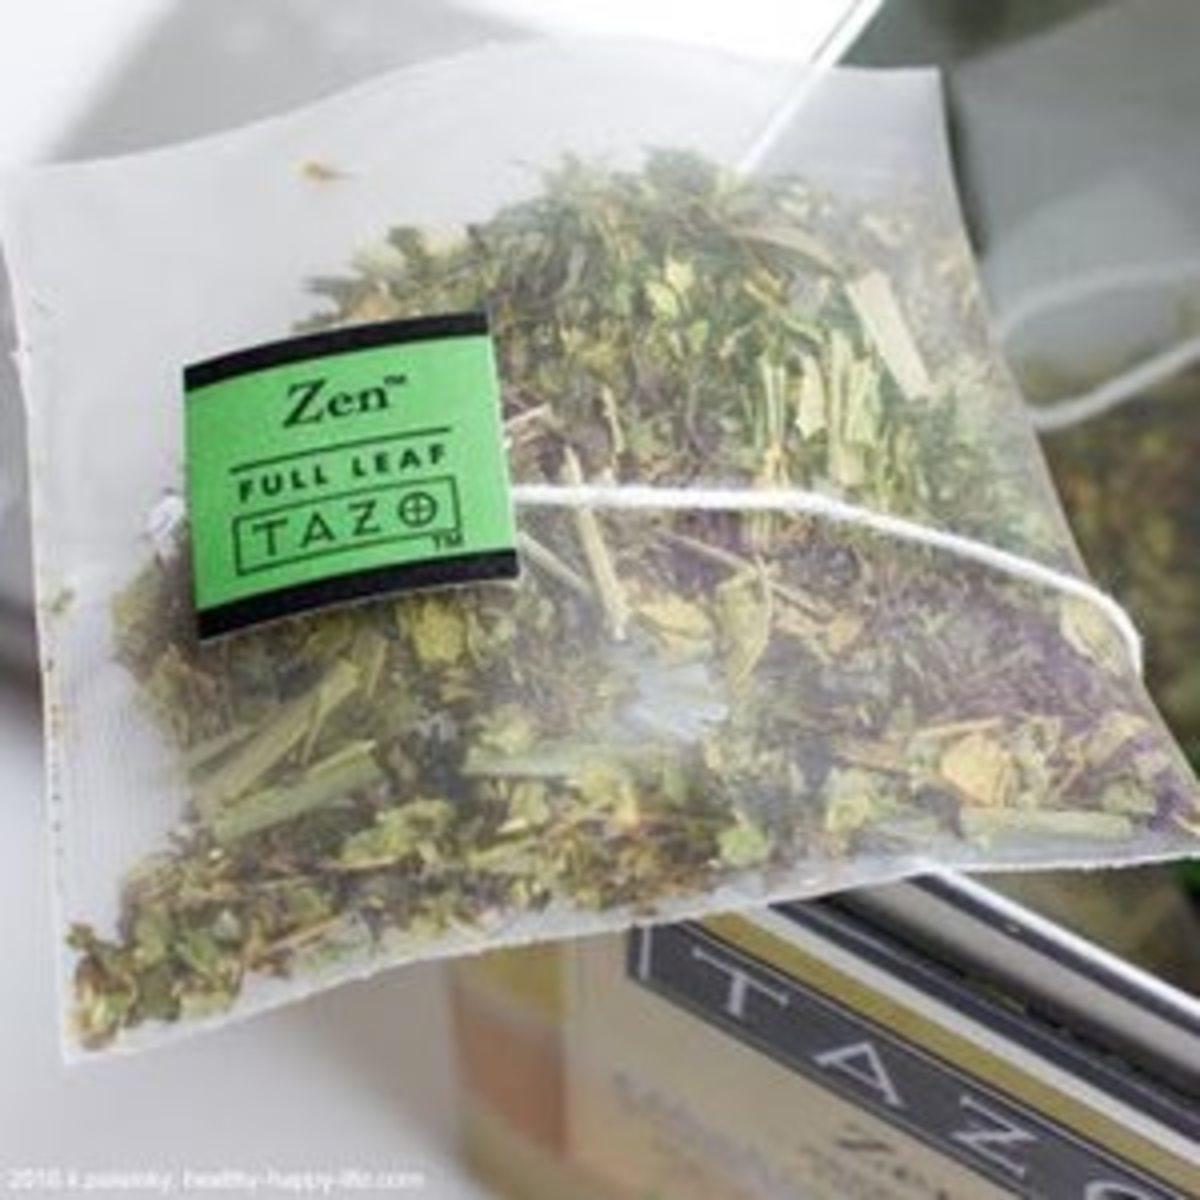 The minty, refreshing Zen green tea.